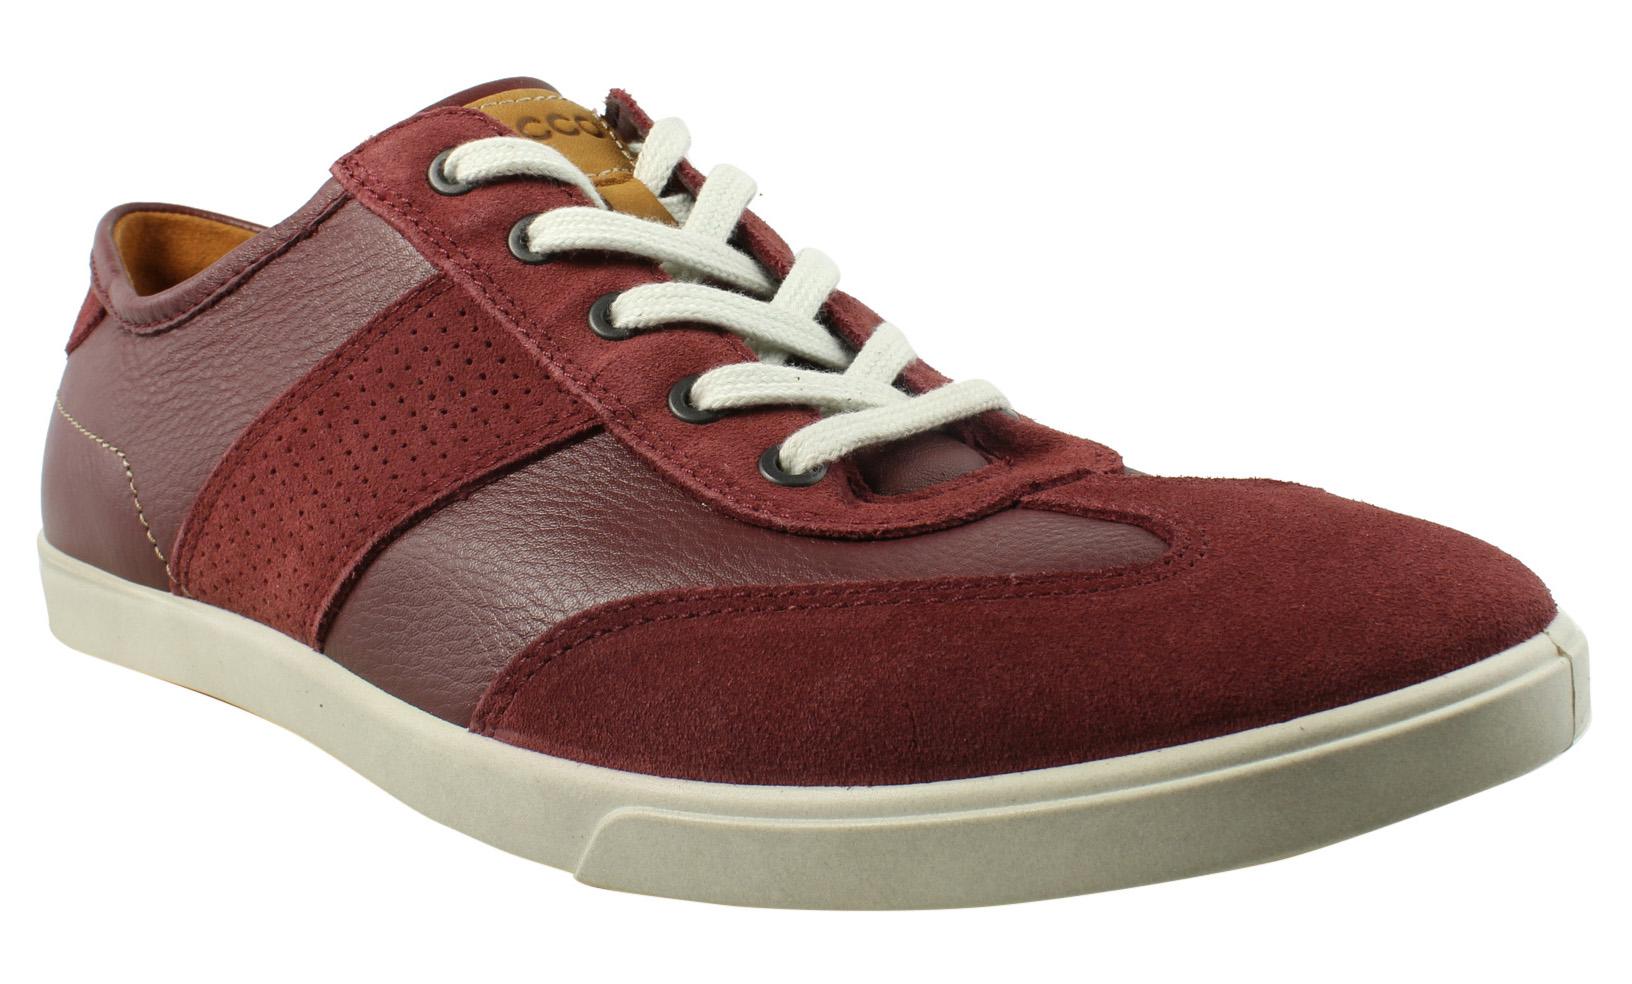 ECCO Mens Collin Port Fashion Shoes Size 12.5 New by Ecco